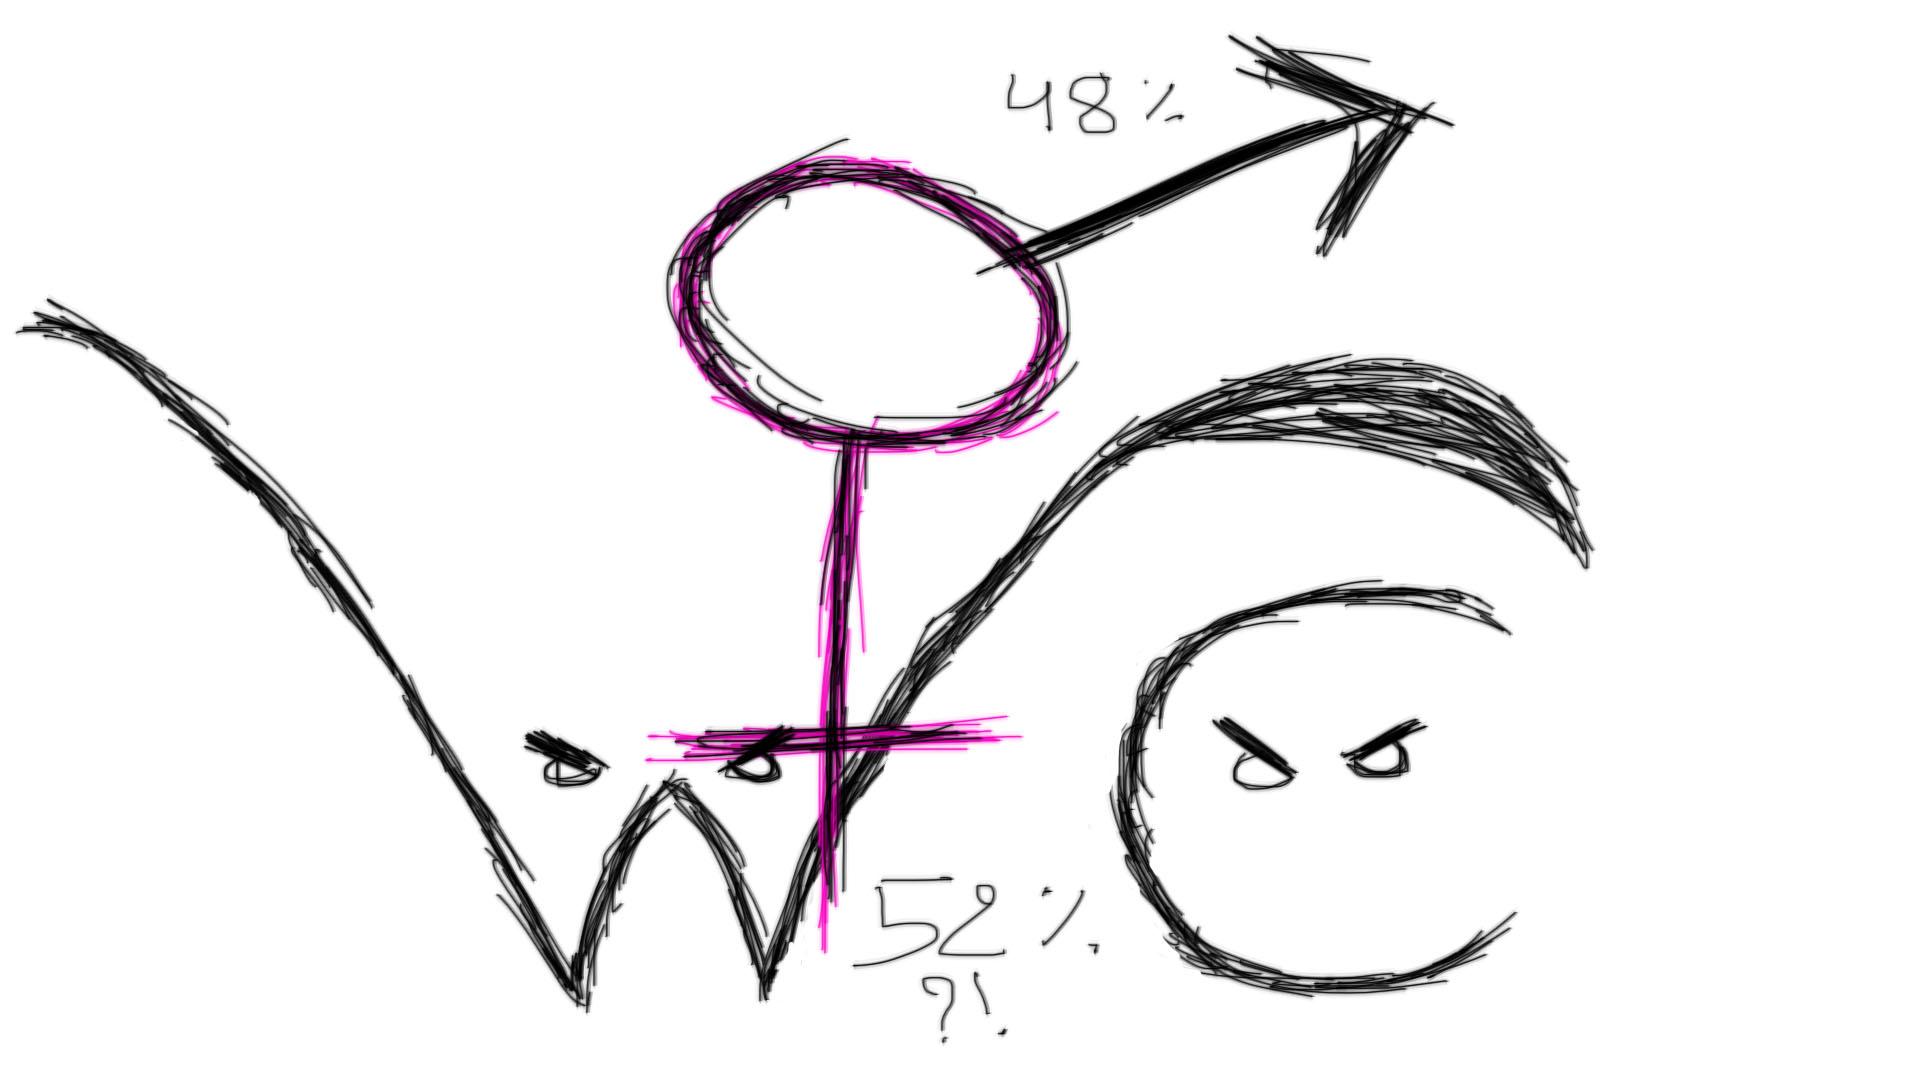 52%_Visant_GeekAnimea